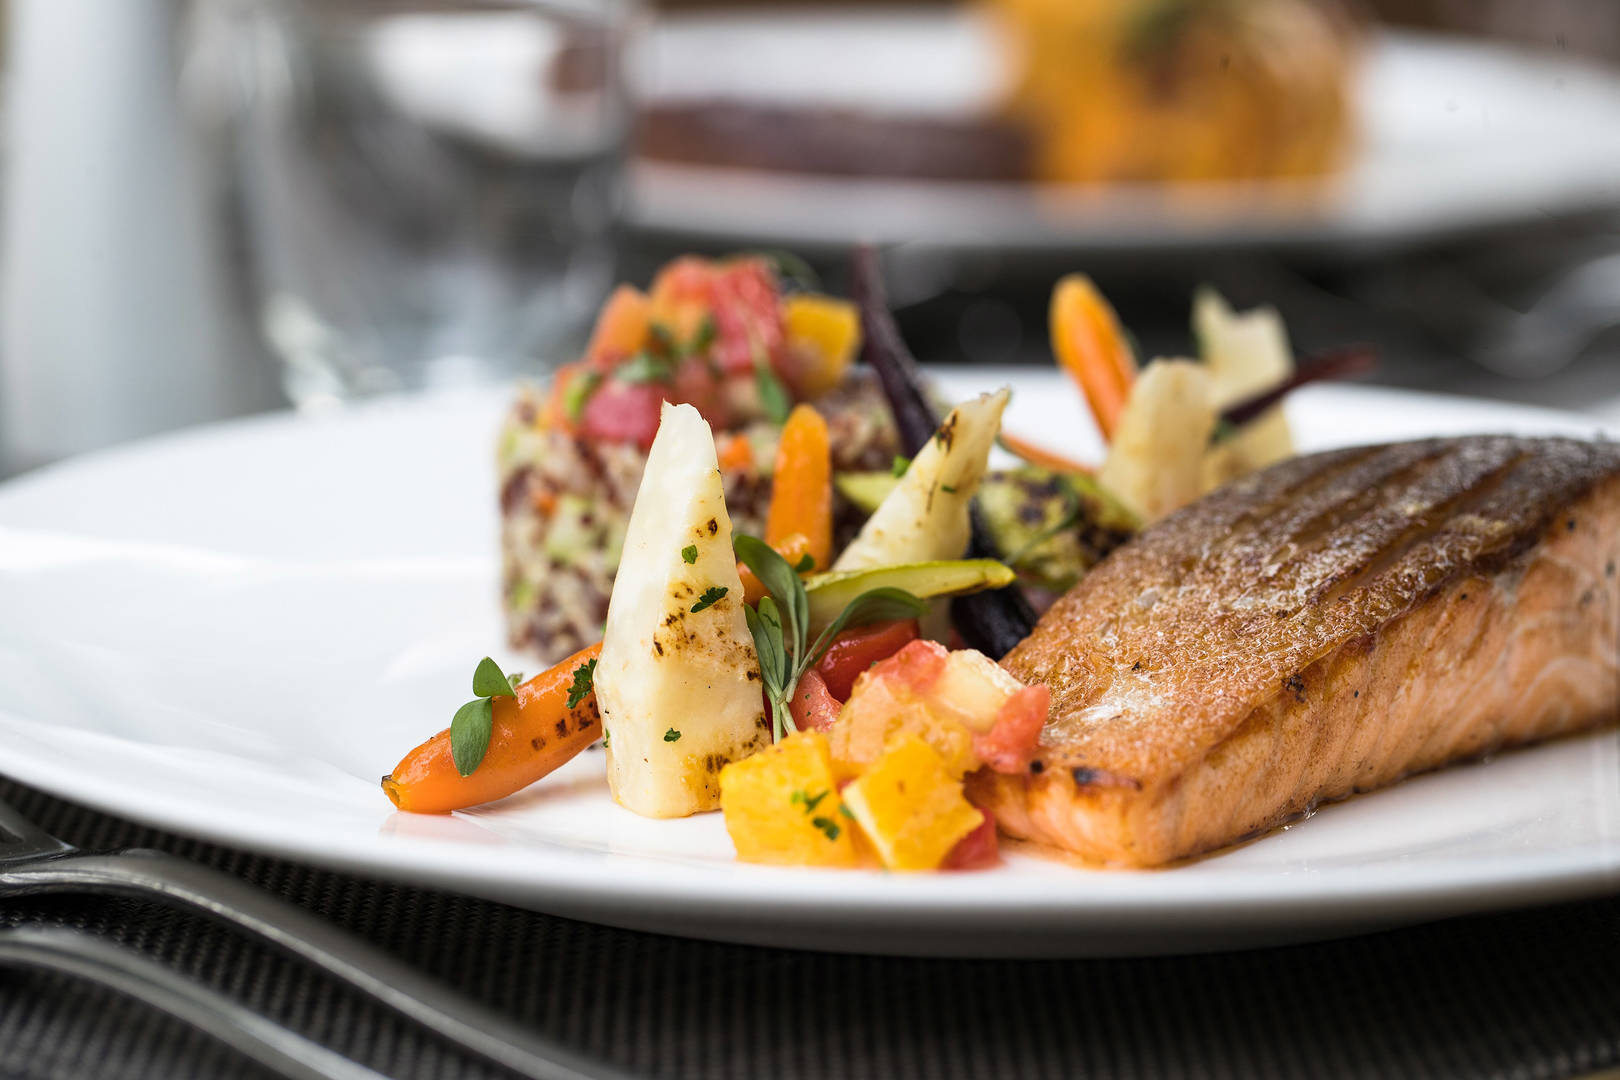 https://cdn.jumeirah.com/-/mediadh/DH/Hospitality/Jumeirah/Restaurants/Dubai/Creekside-Hotel-Nomad/Restaurant-Gallery/Jumeirah-Creekside-Hotel-Nomad-Restaurant-Food-6-4.jpg?h=1080&w=1620&hash=F490E48148DC0C94CF903FE477EFA9AF